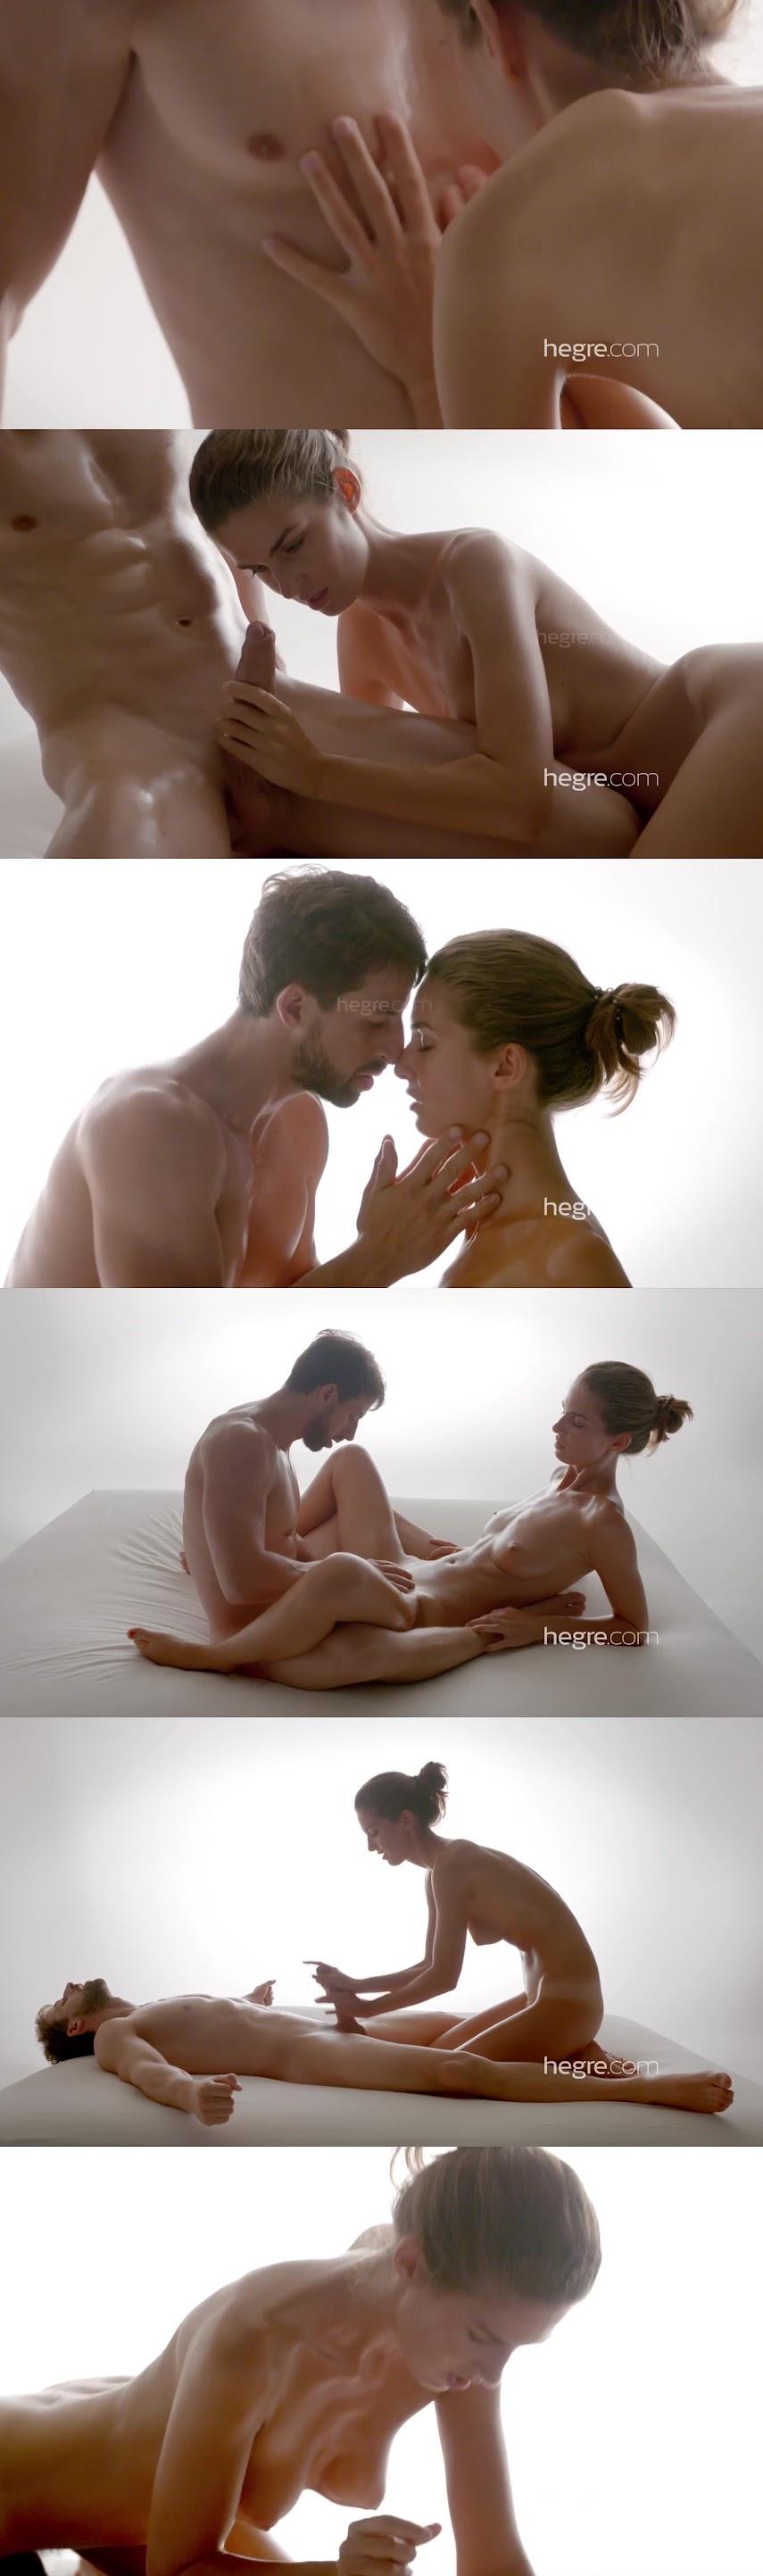 couples.sexual.awakening.massage av 09180